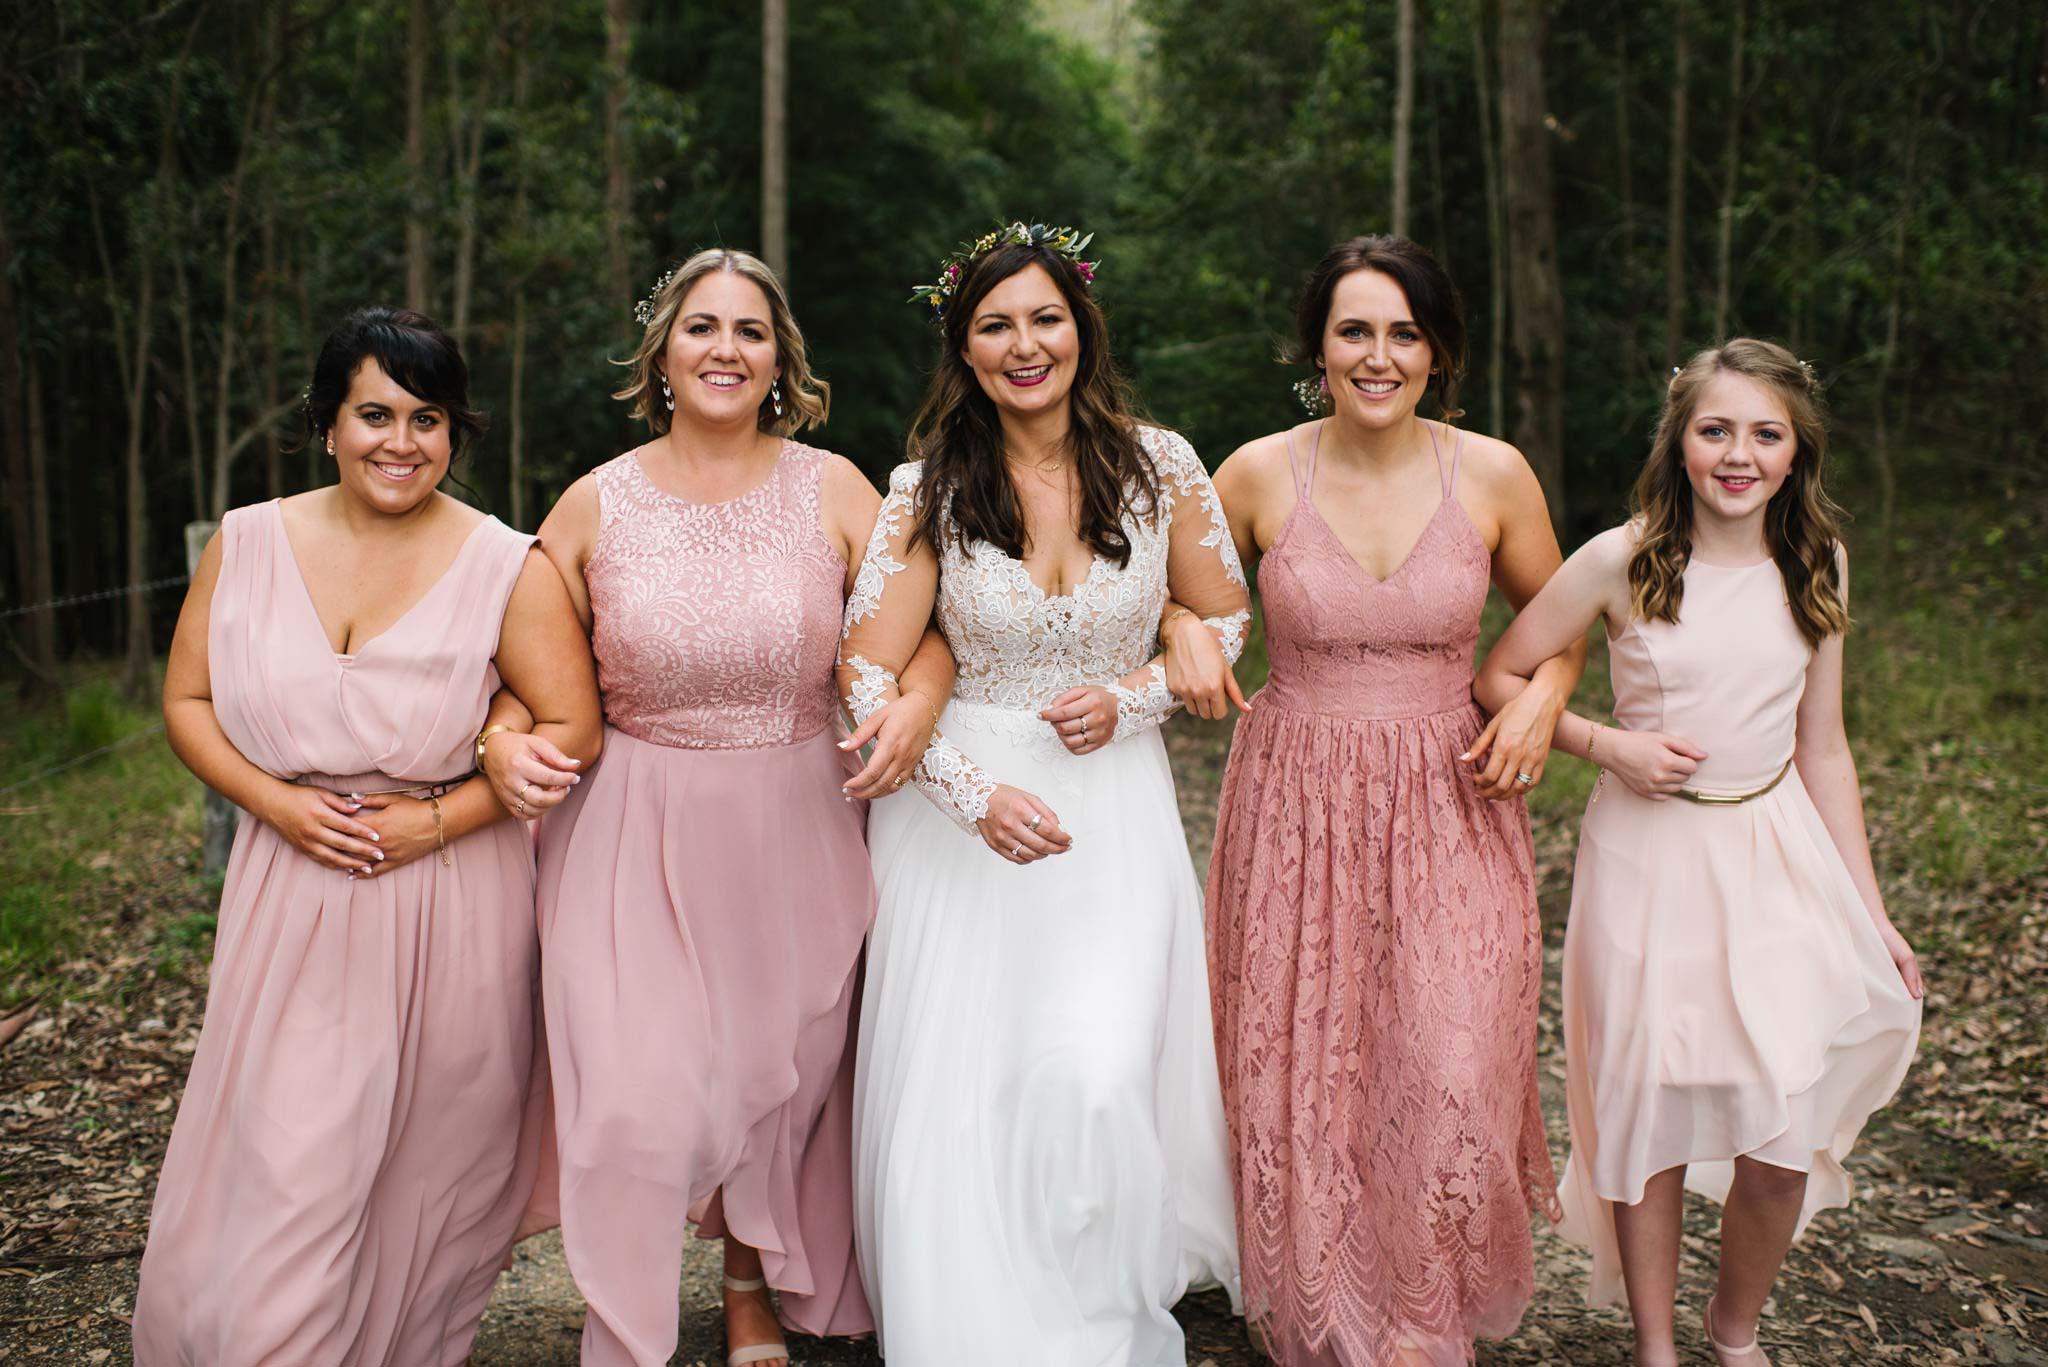 Bride and bridesmaids in various shades of pink